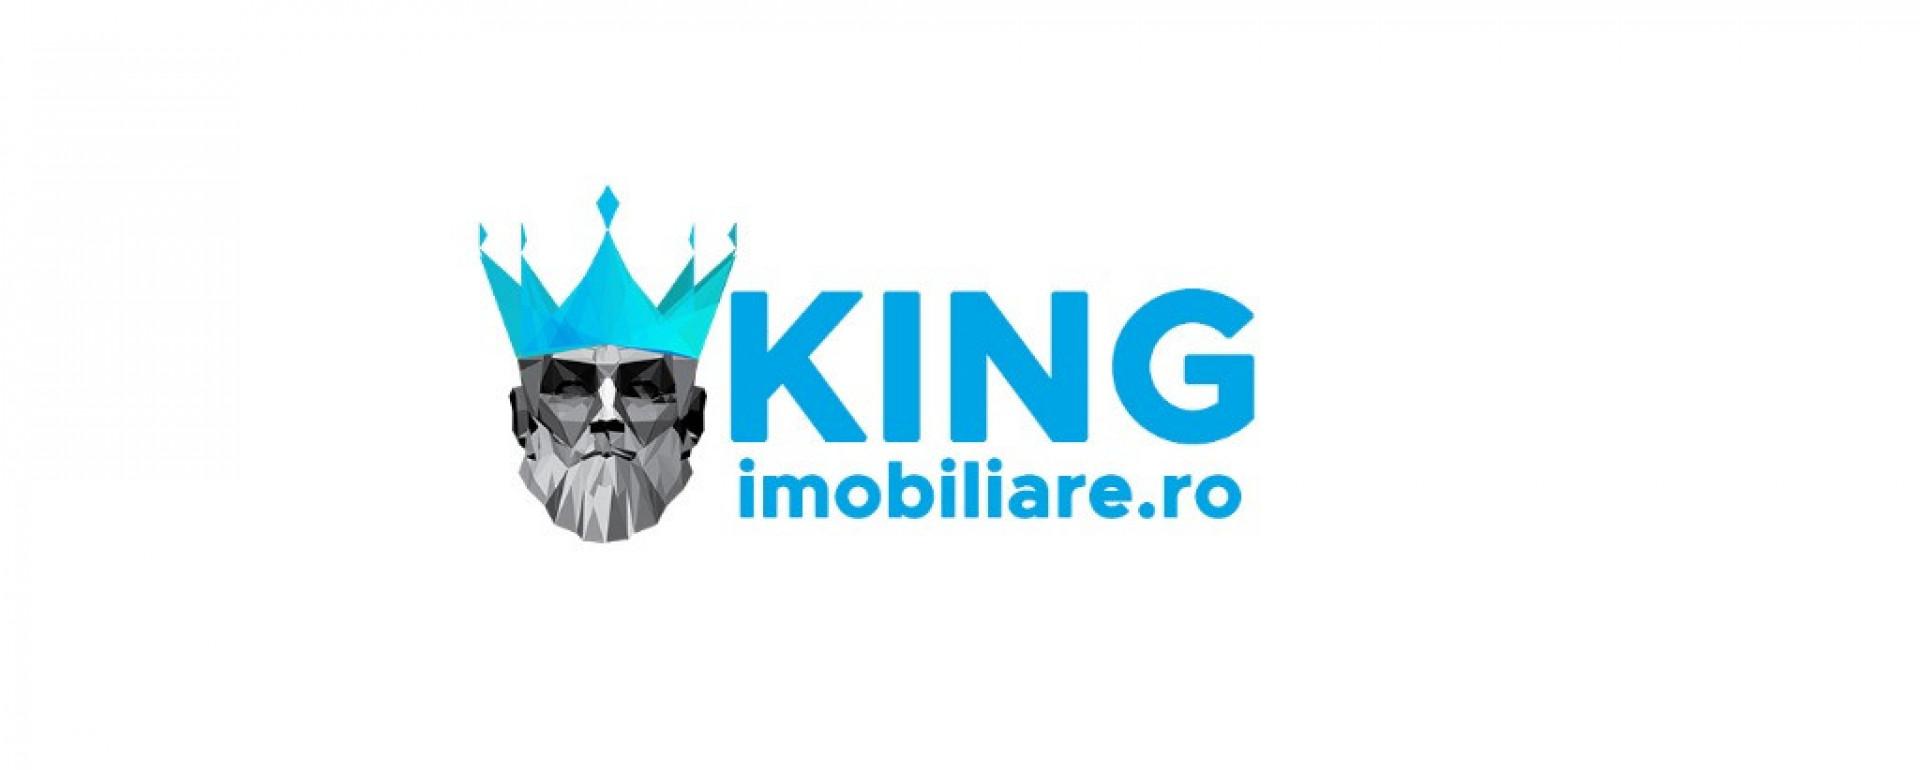 VANZARI KING IMOBILIARE